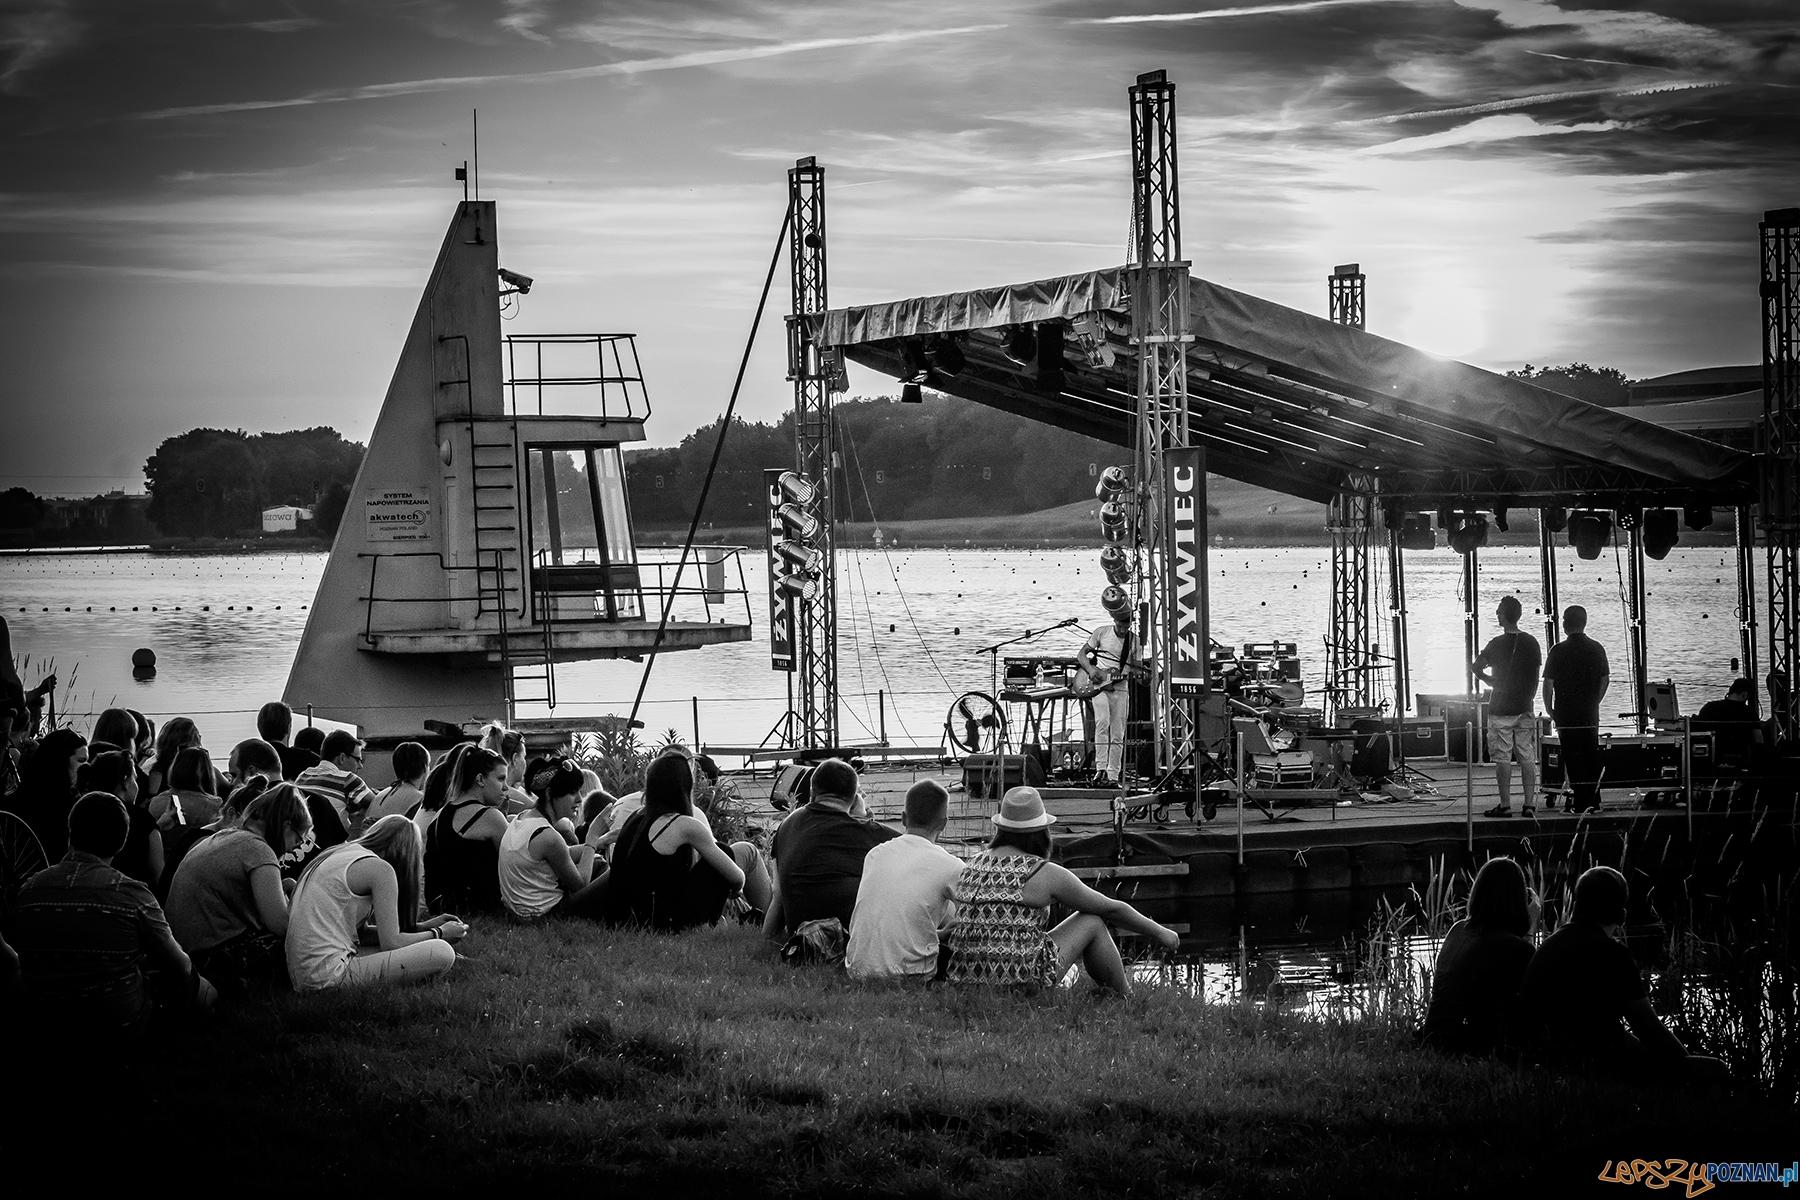 Maltańska Scena Muzyczna (1)  Foto: Joanna Wizmur / POSiR